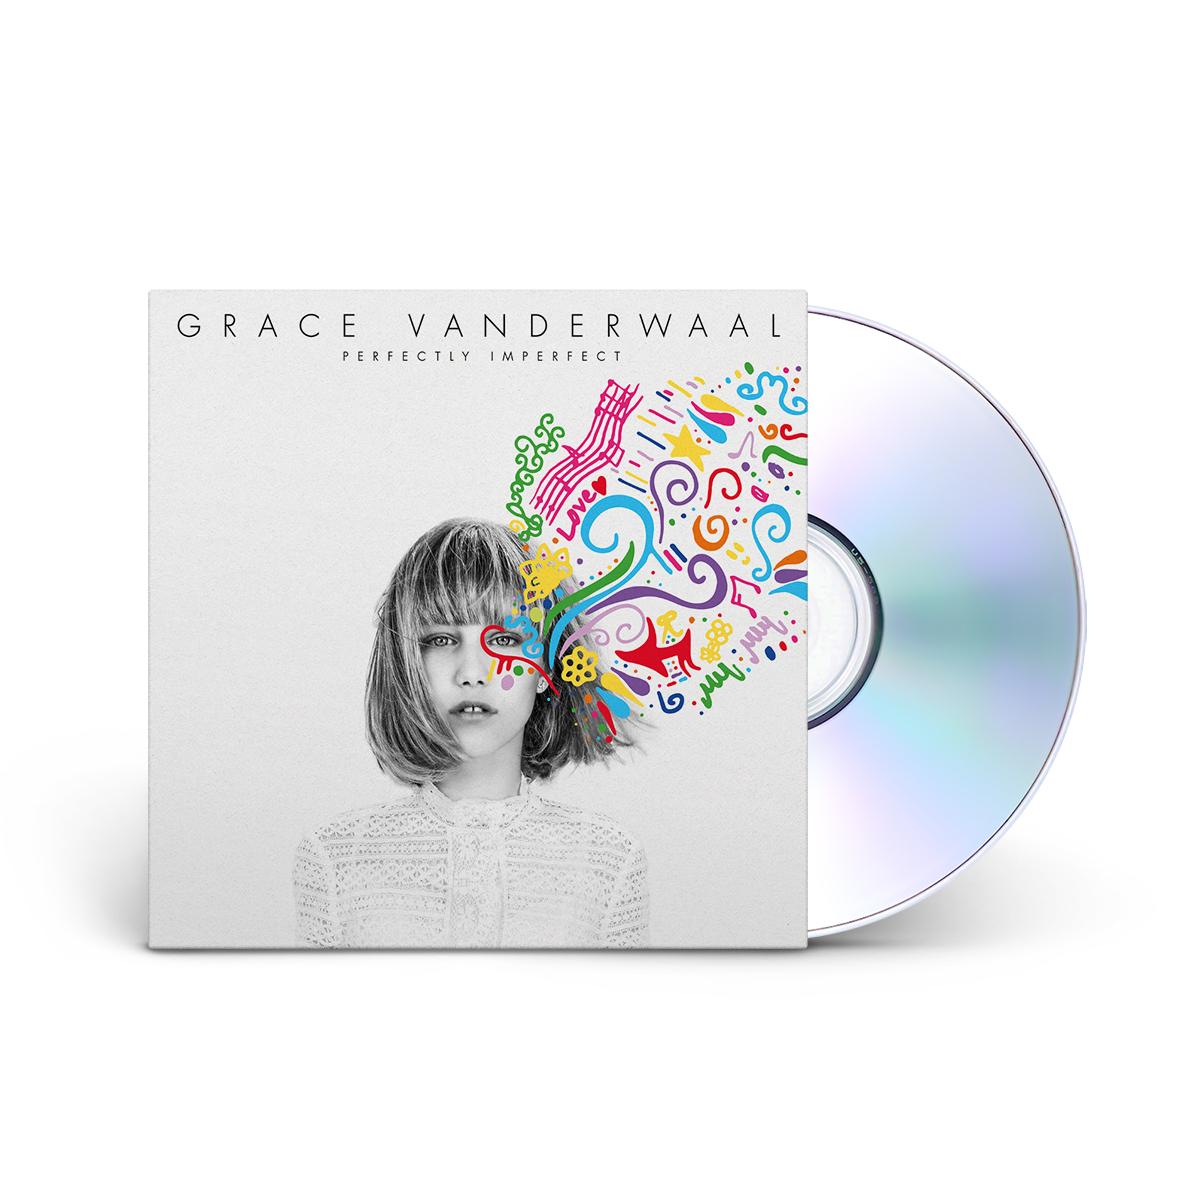 Grace Vanderwaal Perfectly Imperfect EP